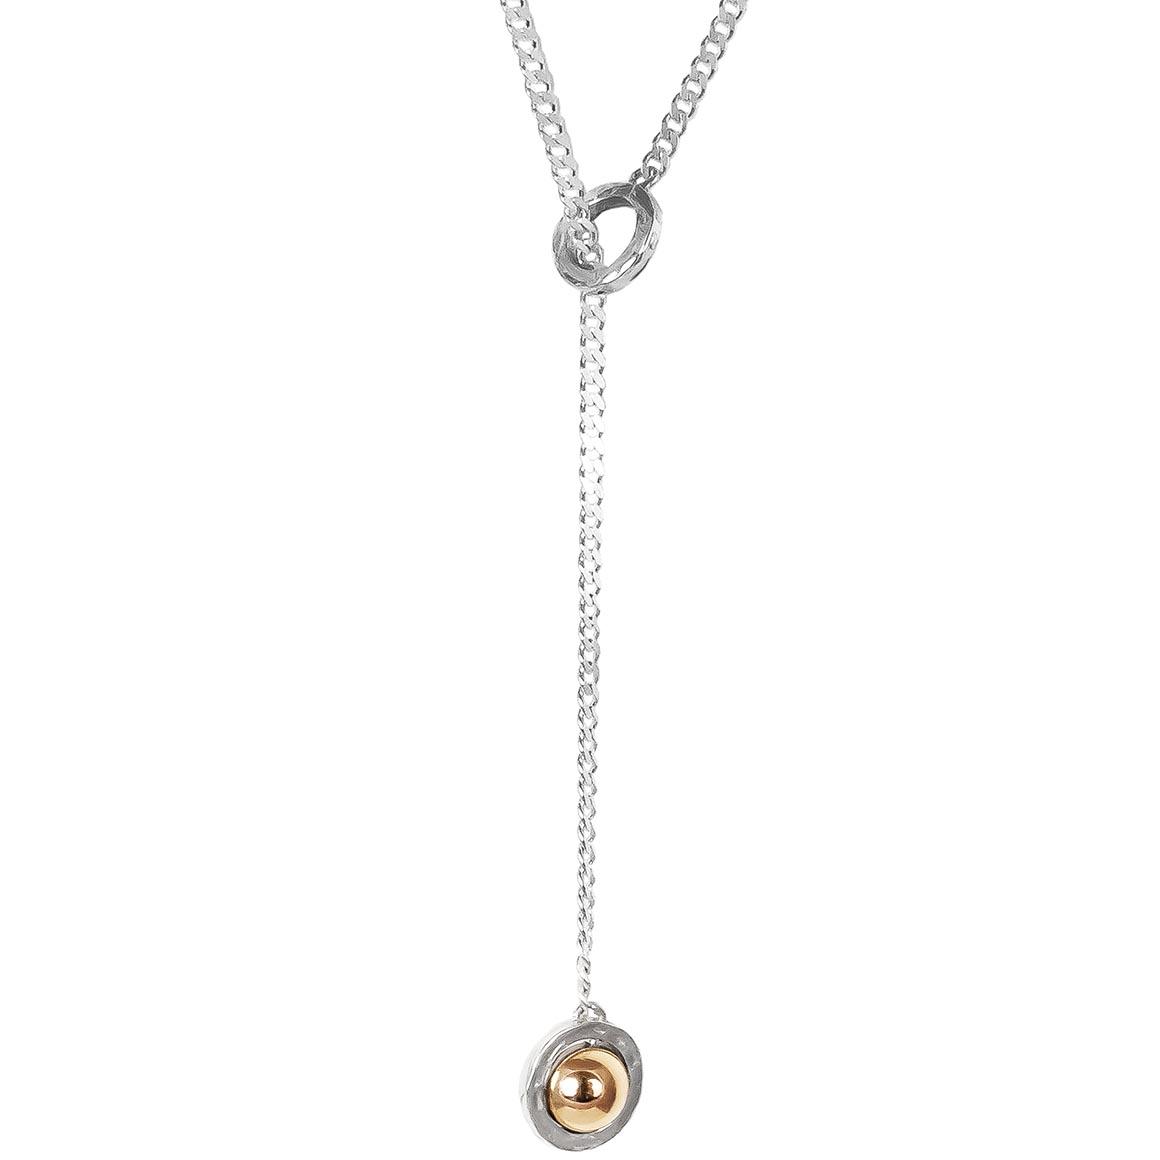 Atticus Large Charm Lariet Necklace   Long | Polished Rose Detail | Trada Marketplace